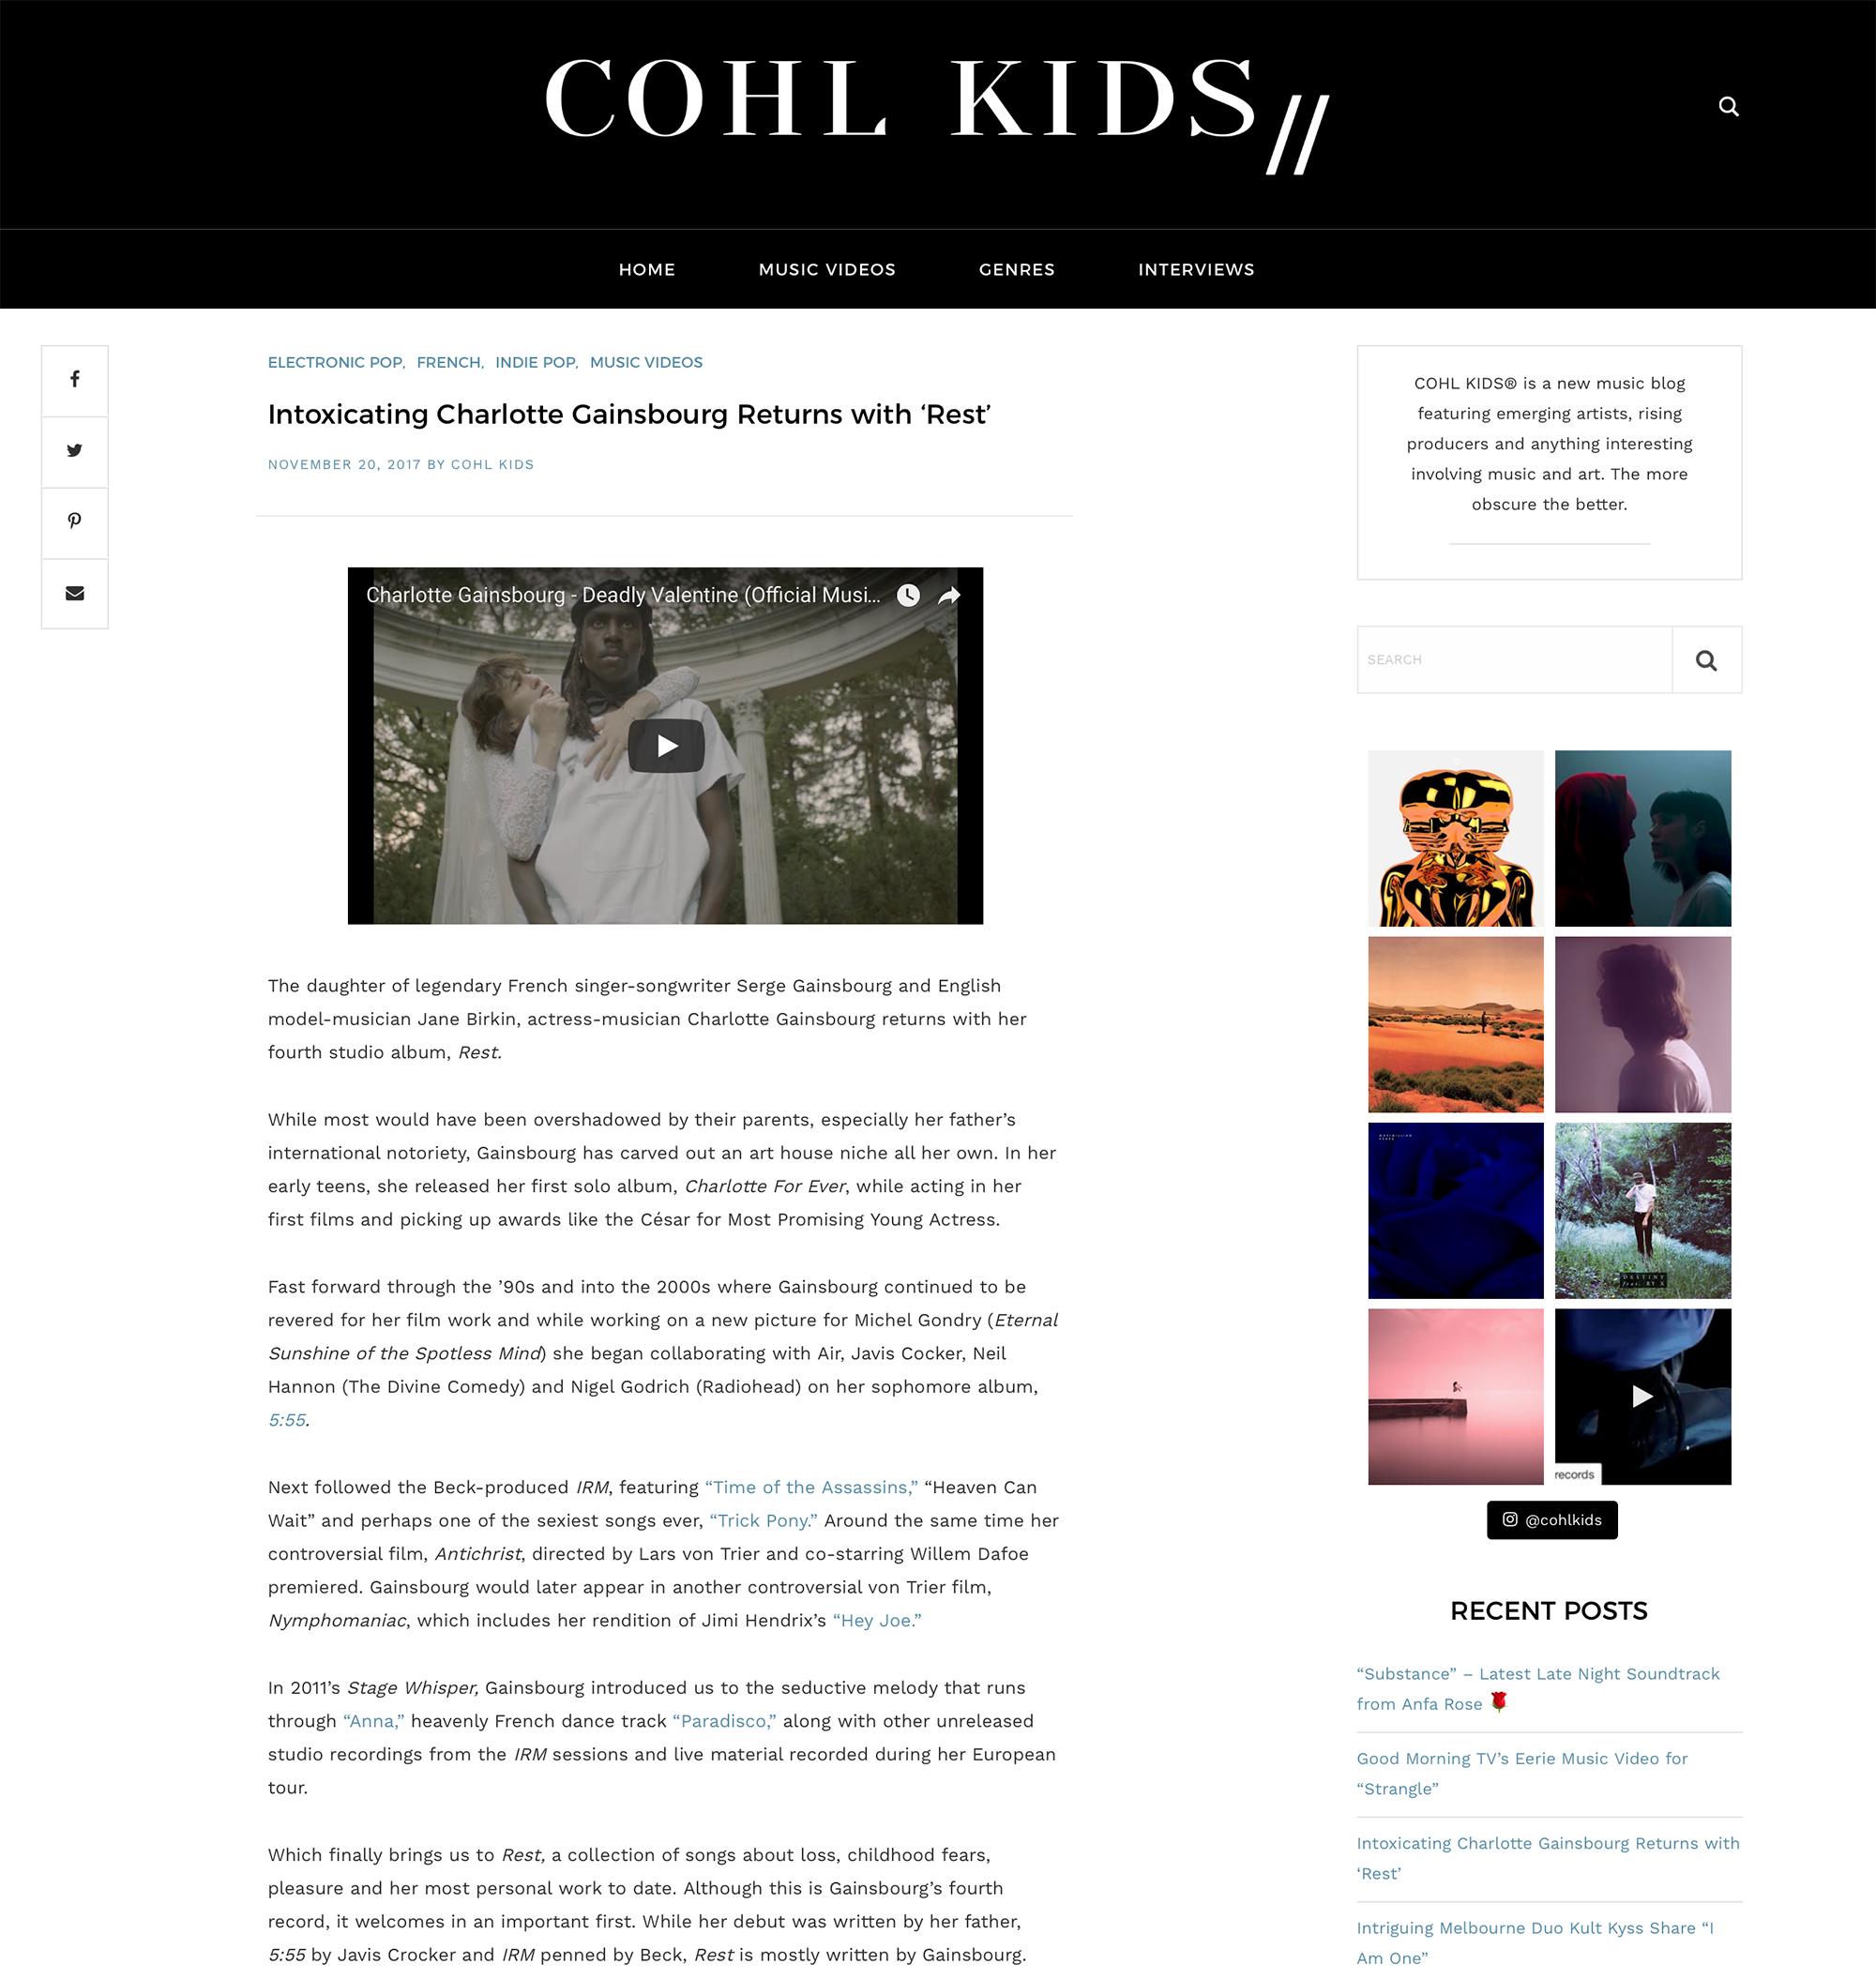 COHL KIDS Website Article.jpg